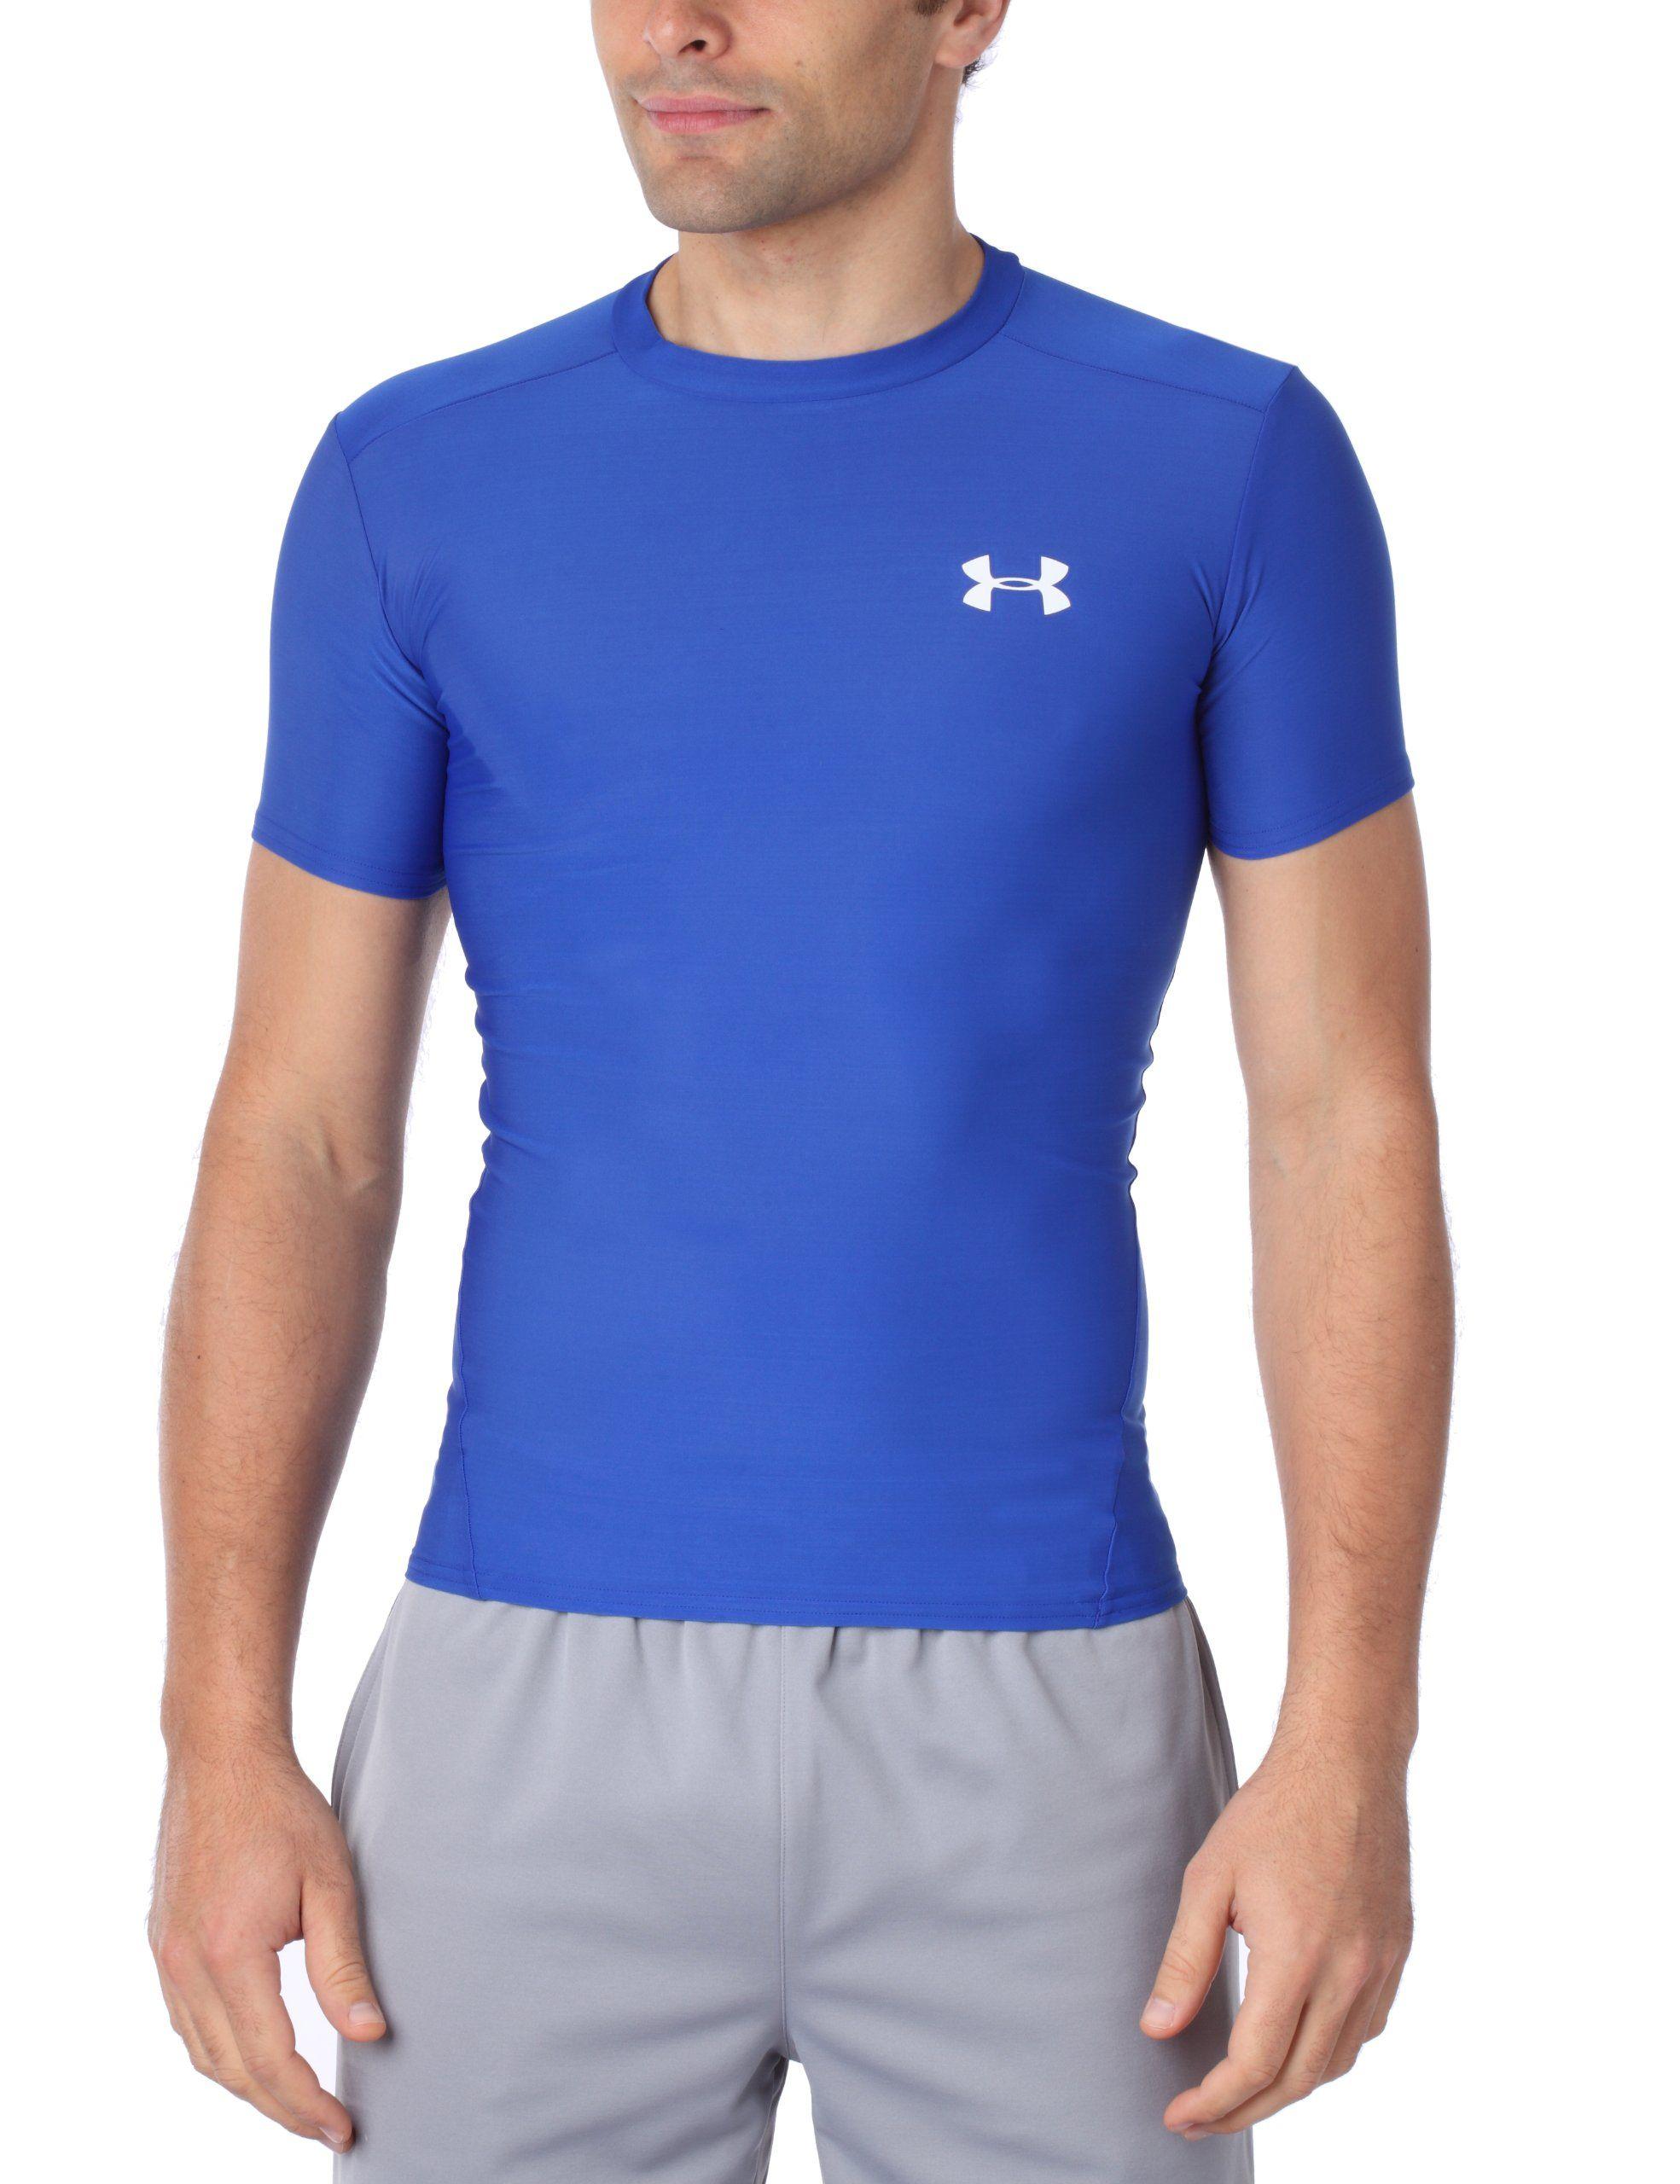 super popular 32022 9d284 Under Armour Mens HeatGear Compression Short Sleeve T-Shirt Large Royal.  4-way